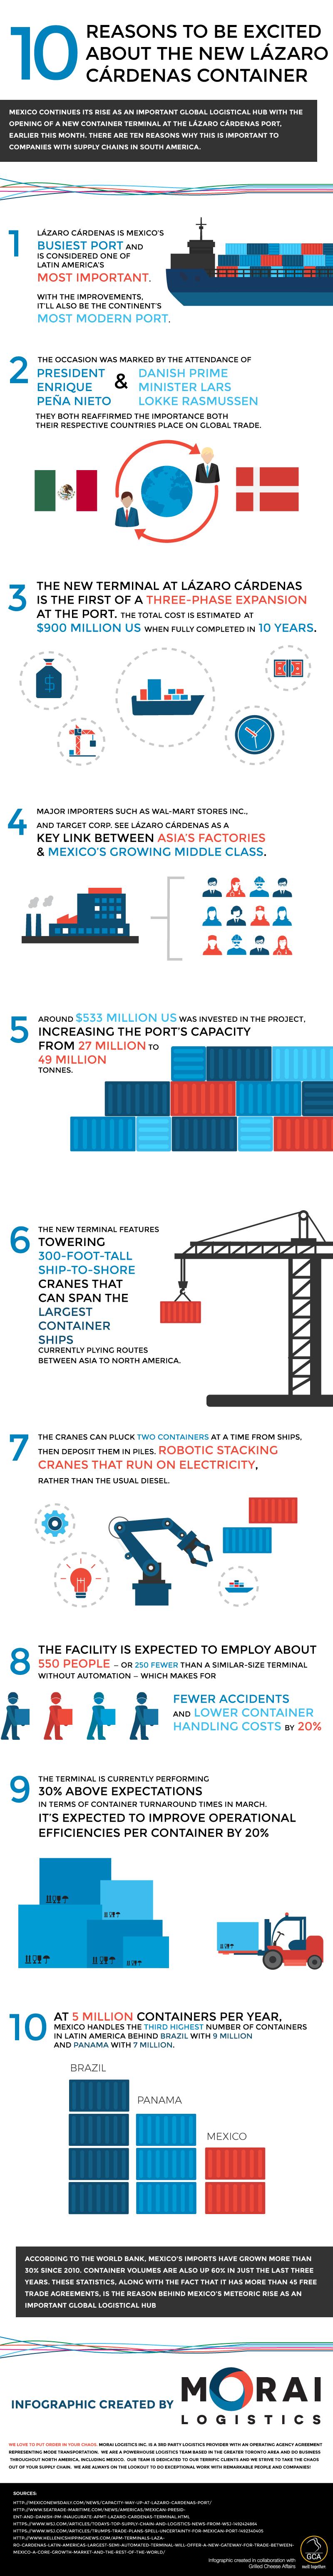 Morai-Infographic-LazaroCardenas